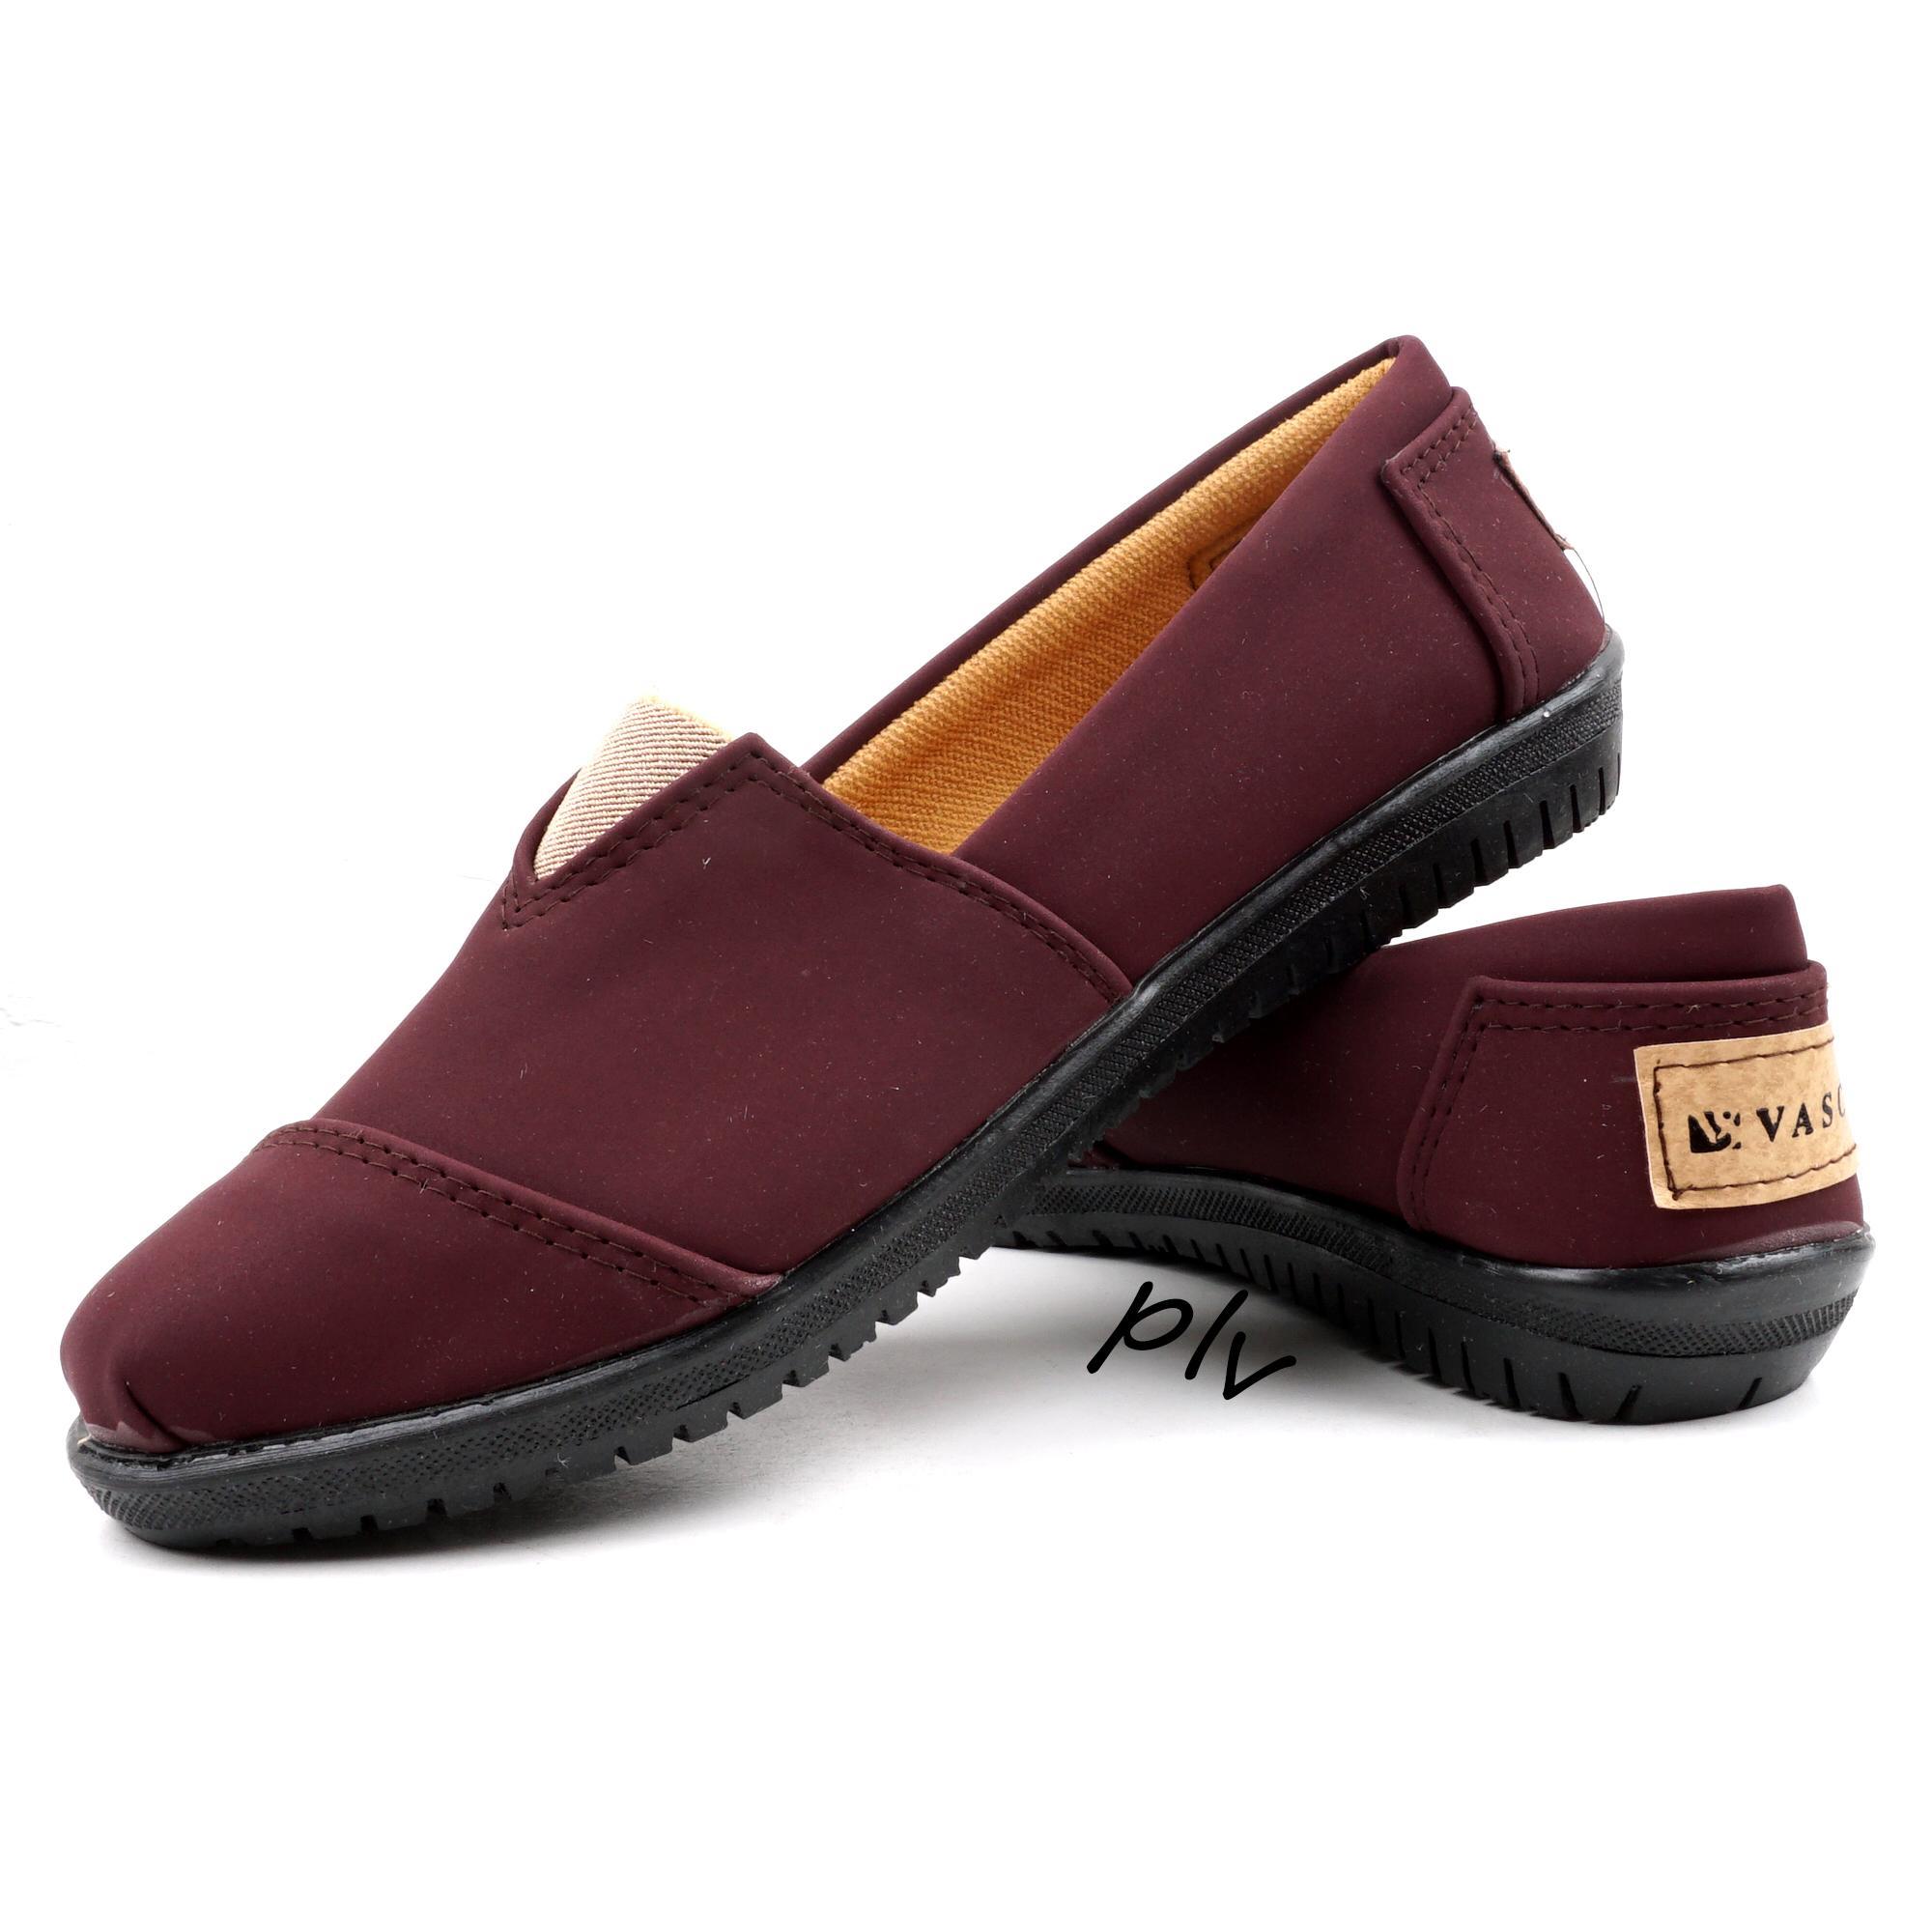 Pluvia - Vasco Sepatu Flat Shoes Slip On Wanita Toms - Maroon